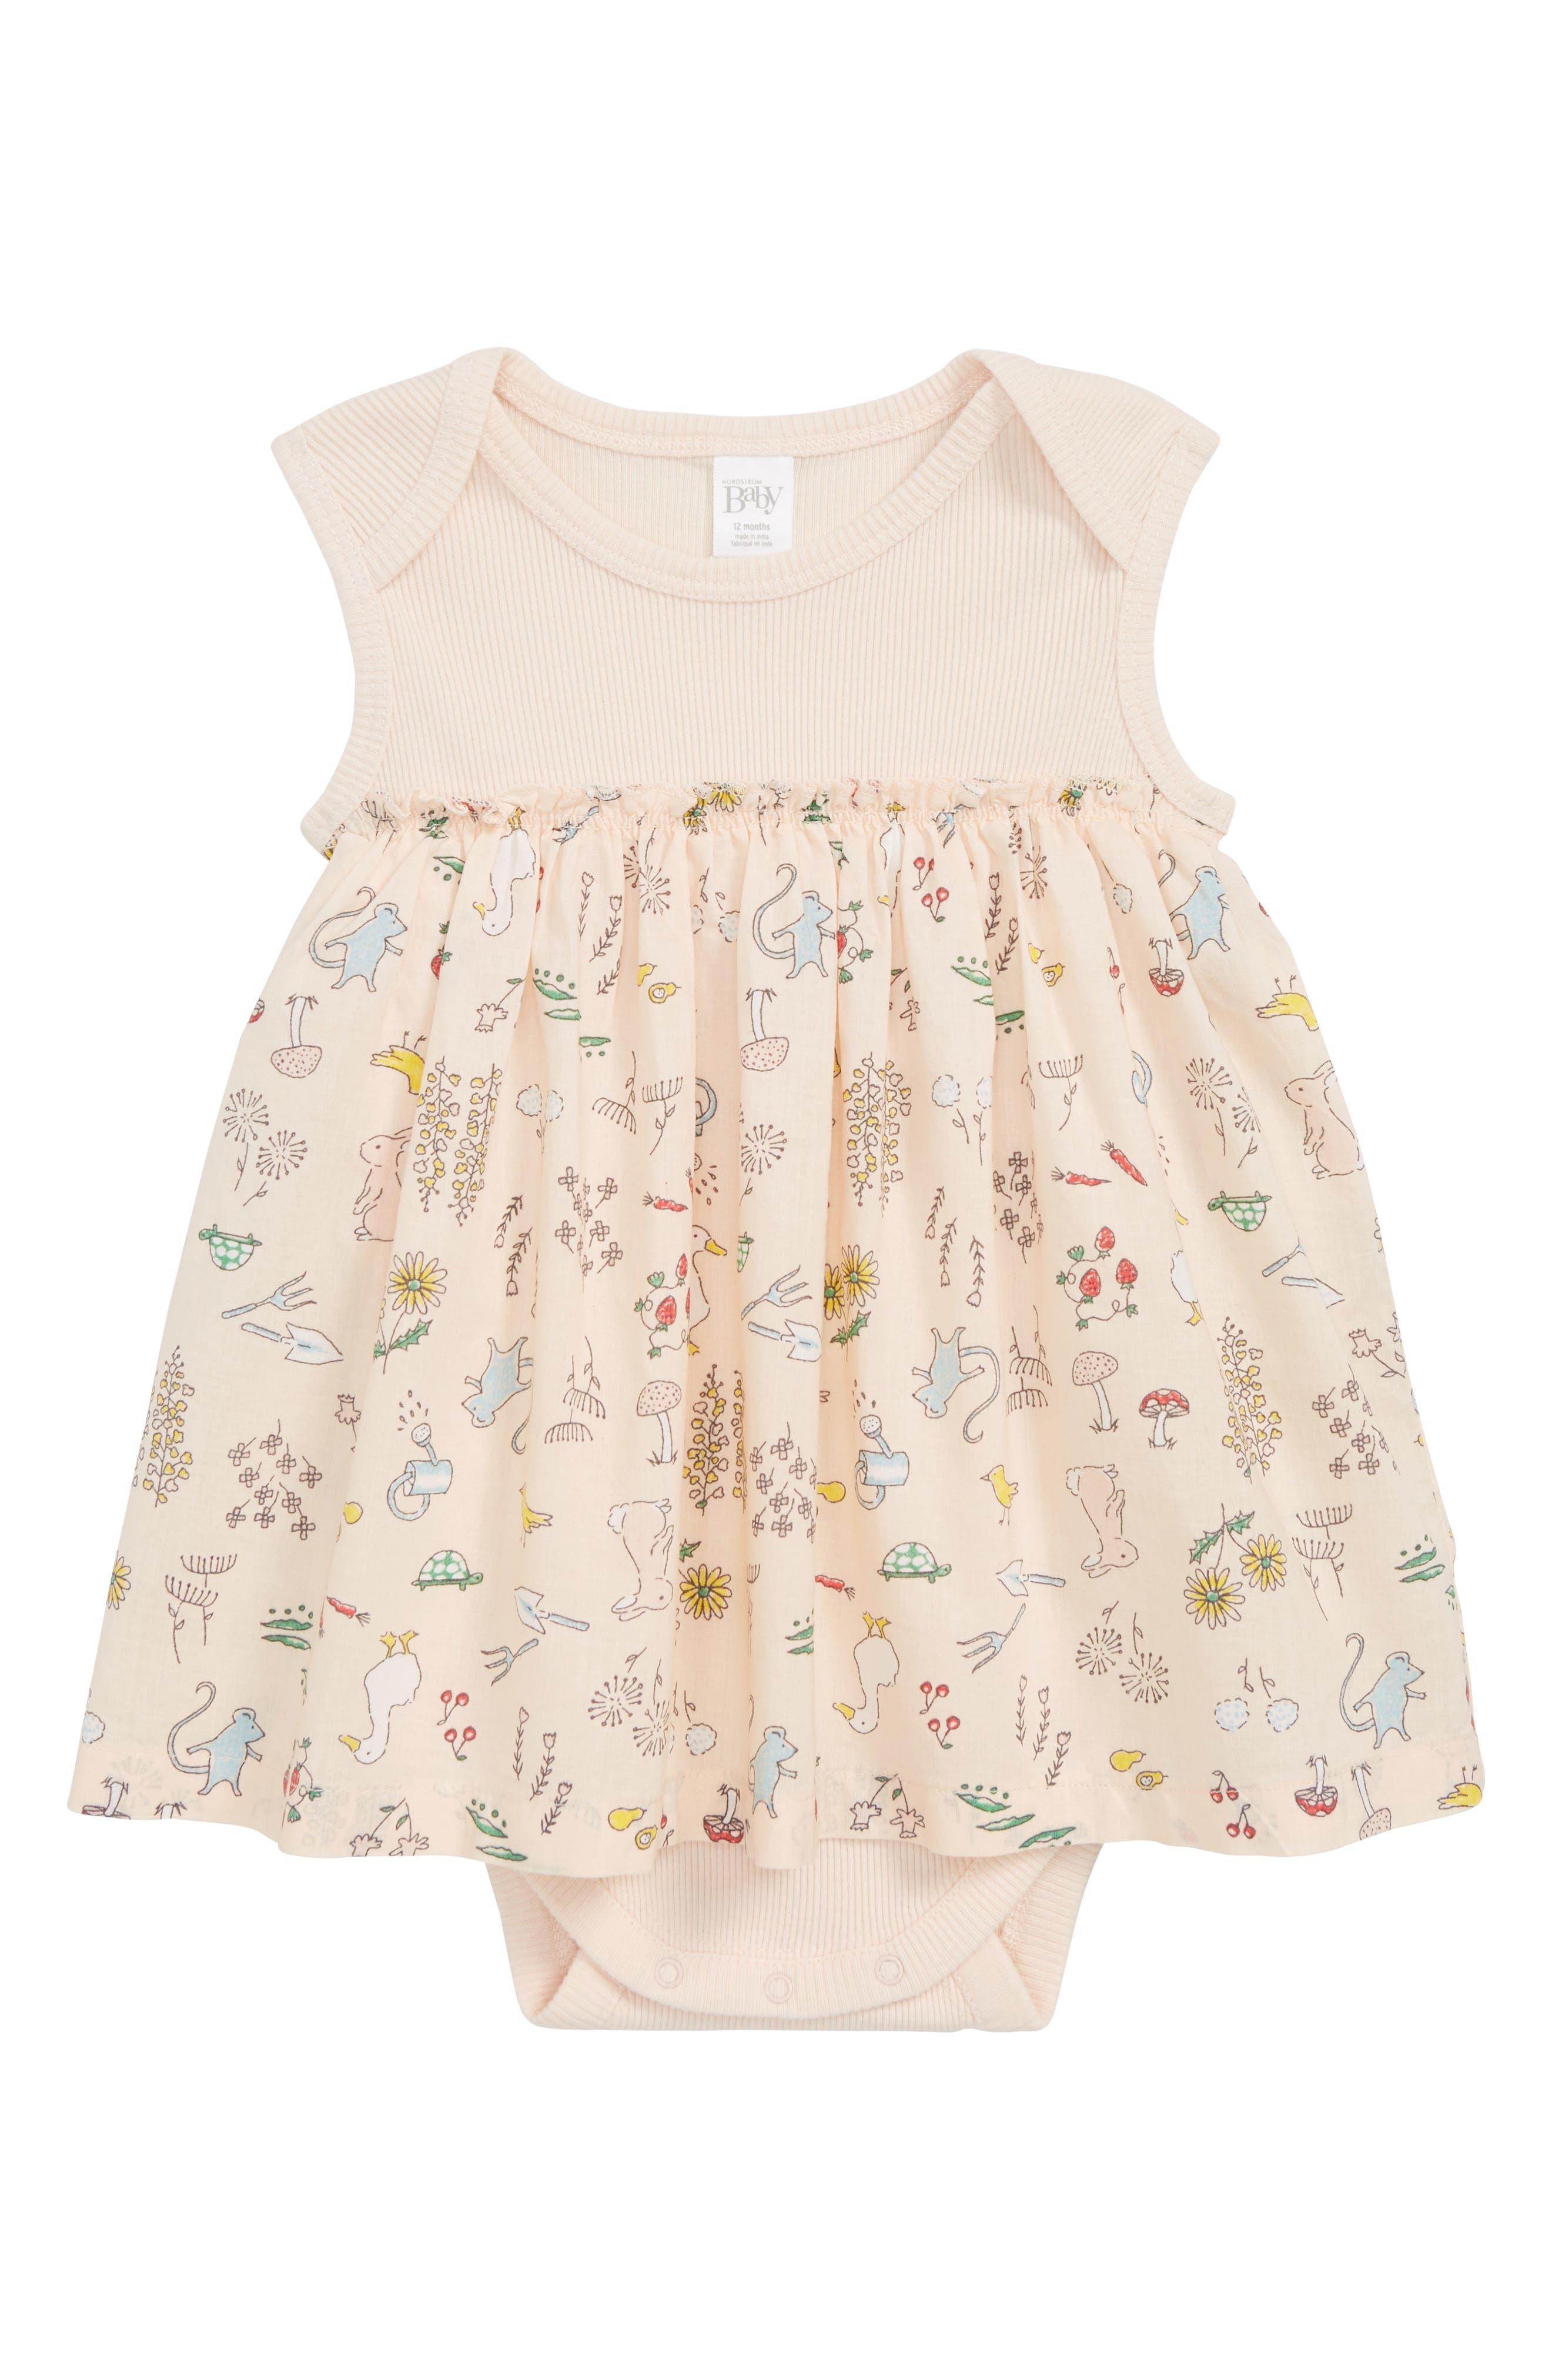 NORDSTROM BABY Bodysuit Dress, Main, color, 680